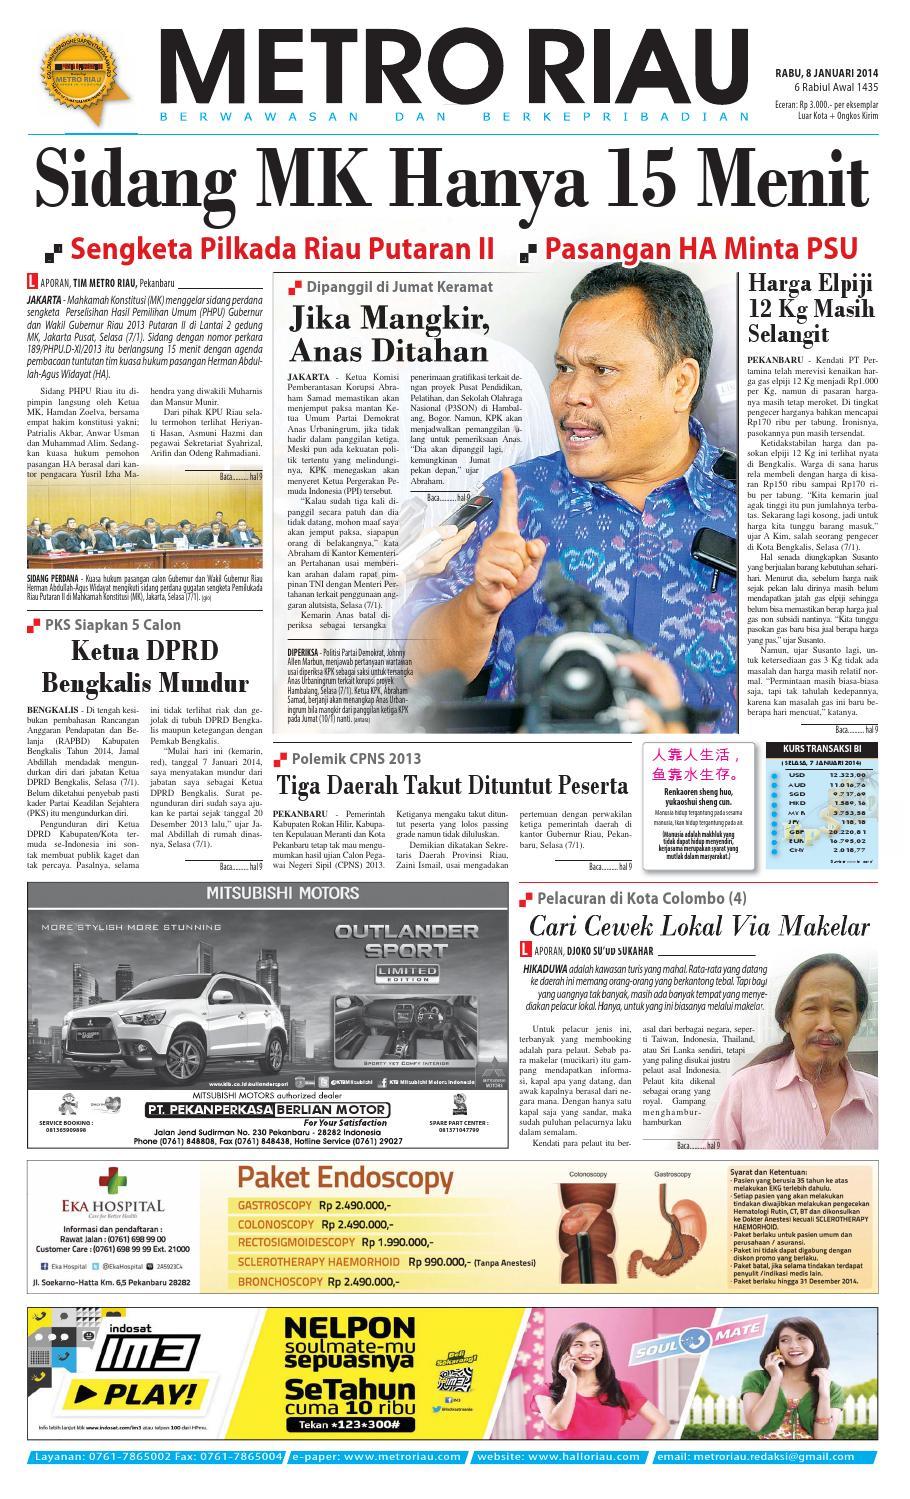 080114 By Harian Pagi Metro Riau Issuu Produk Ukm Bumn Gaun Putih Maya Raisa Kebaya